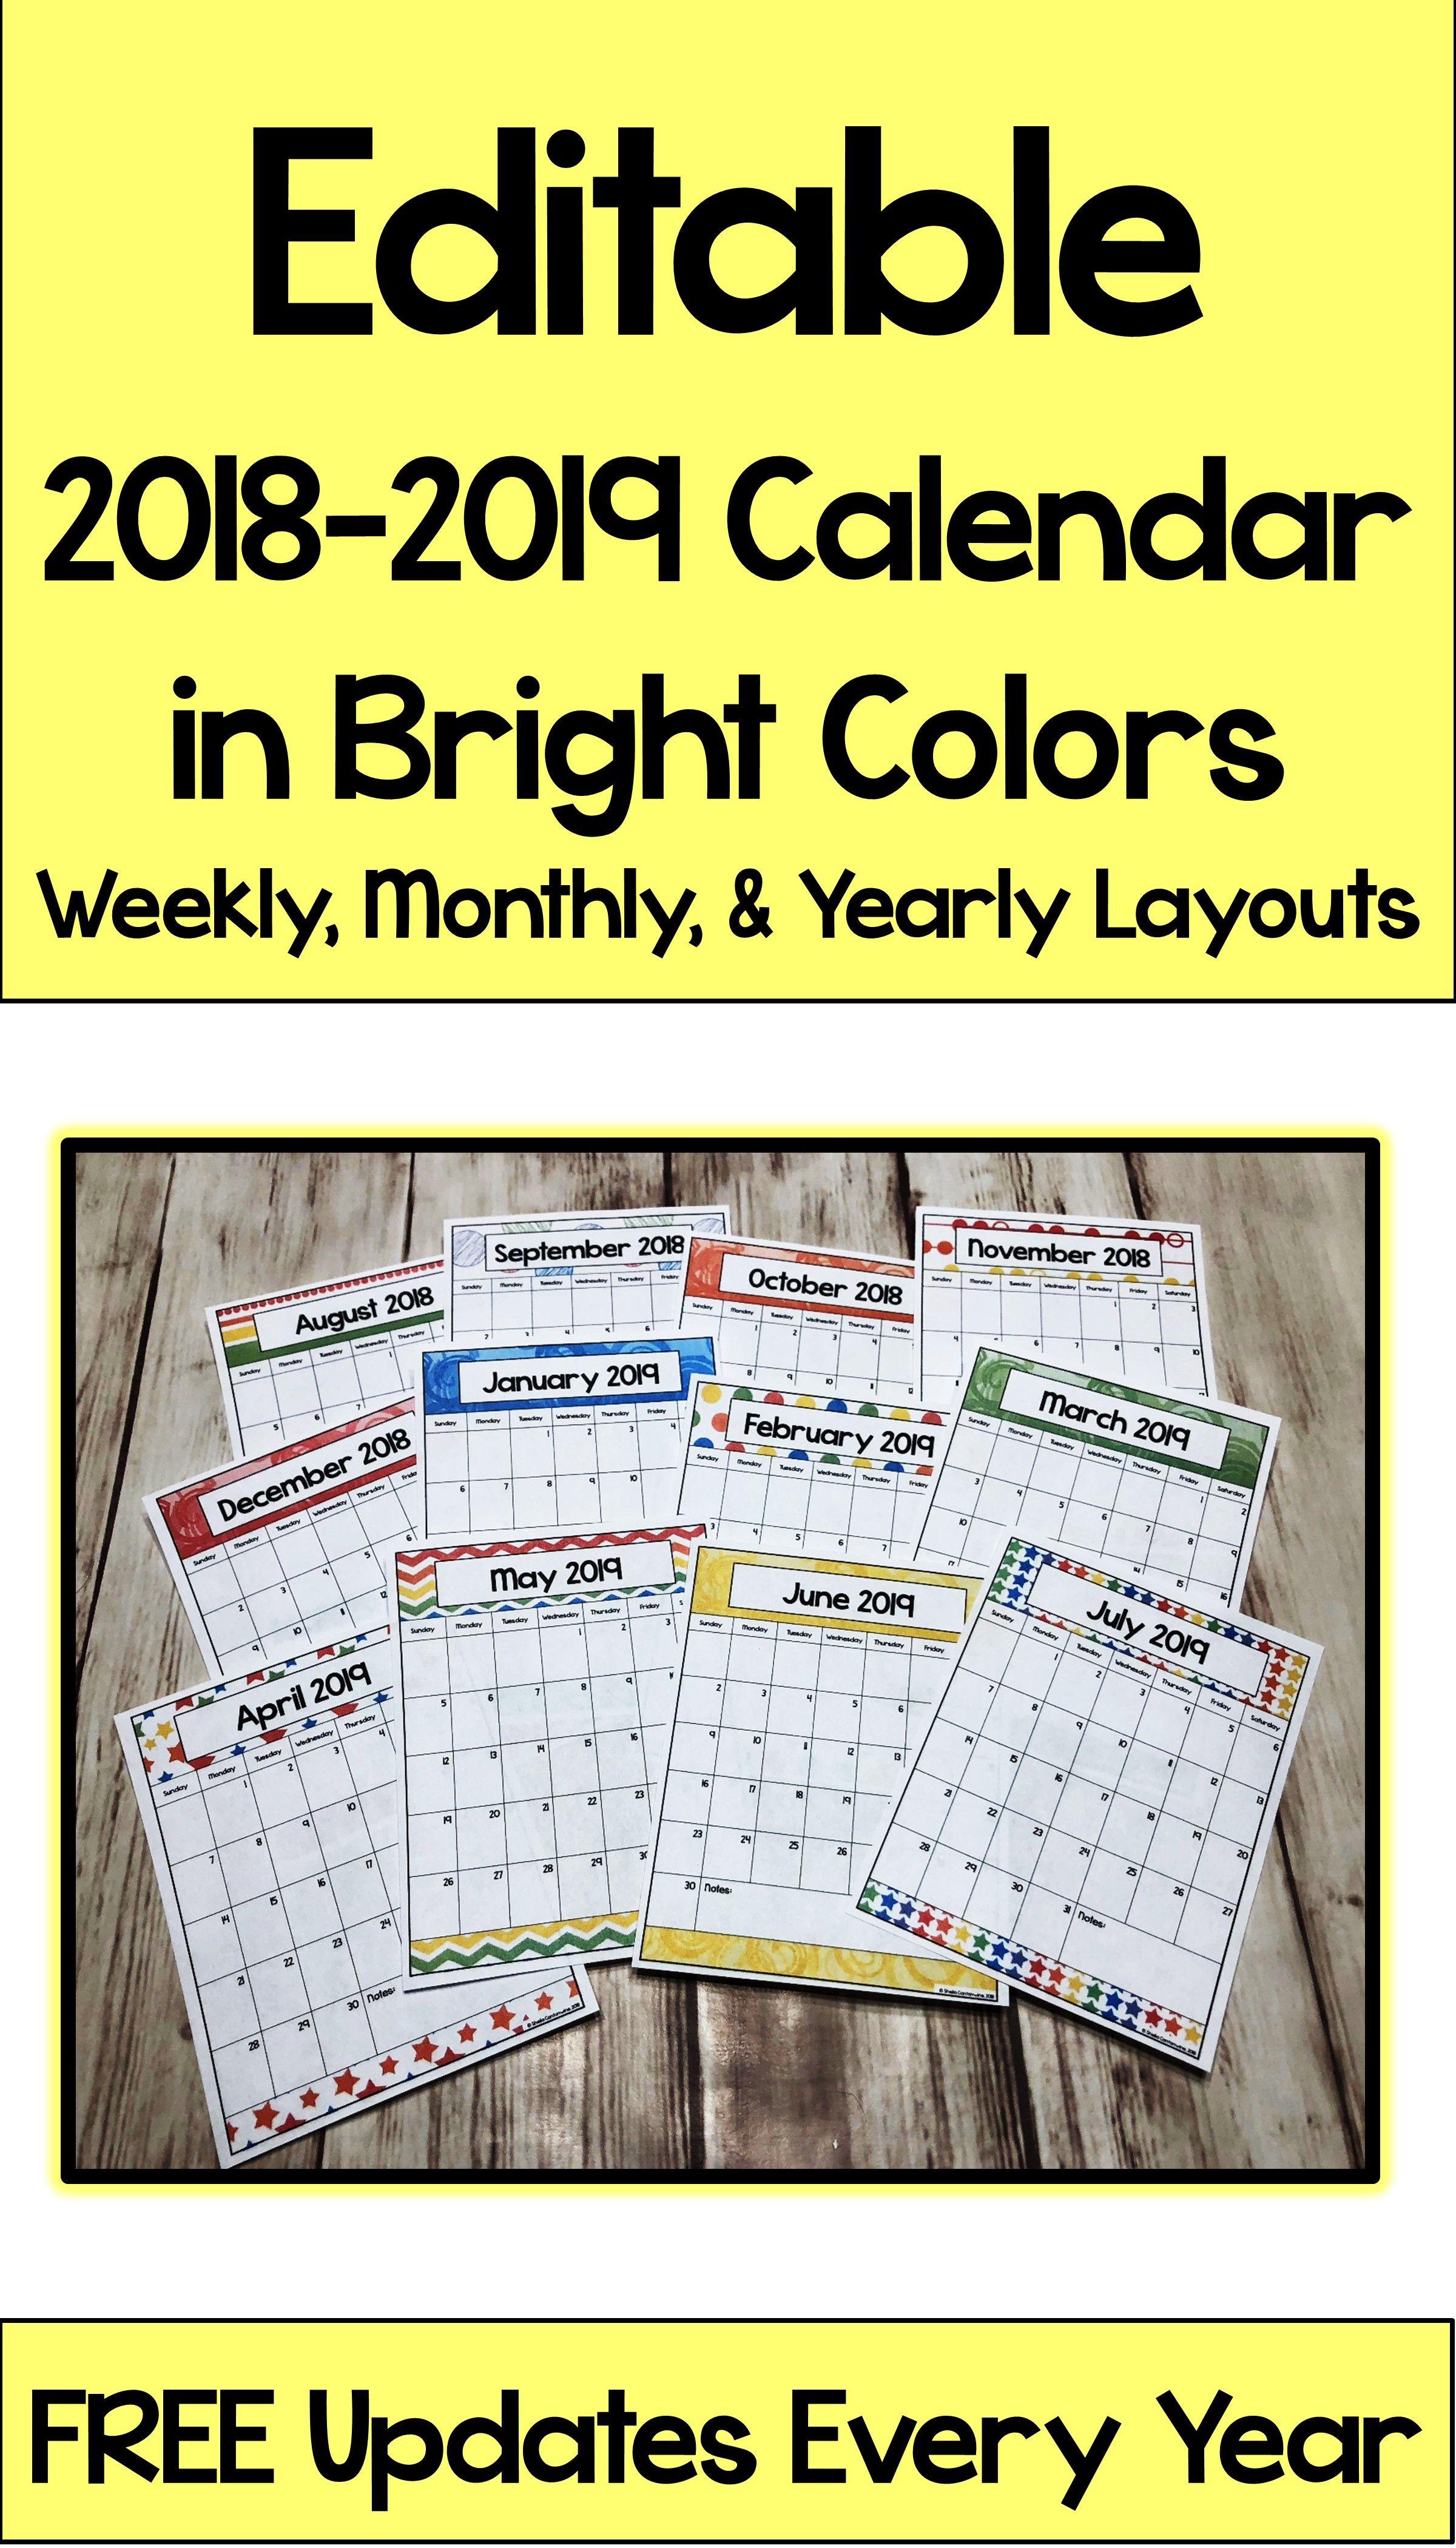 2022 Primary Calendar.2021 2022 Editable Bright Calendar And Planner With Digital Printable Options Calendar Classroom Calendar School Calendar